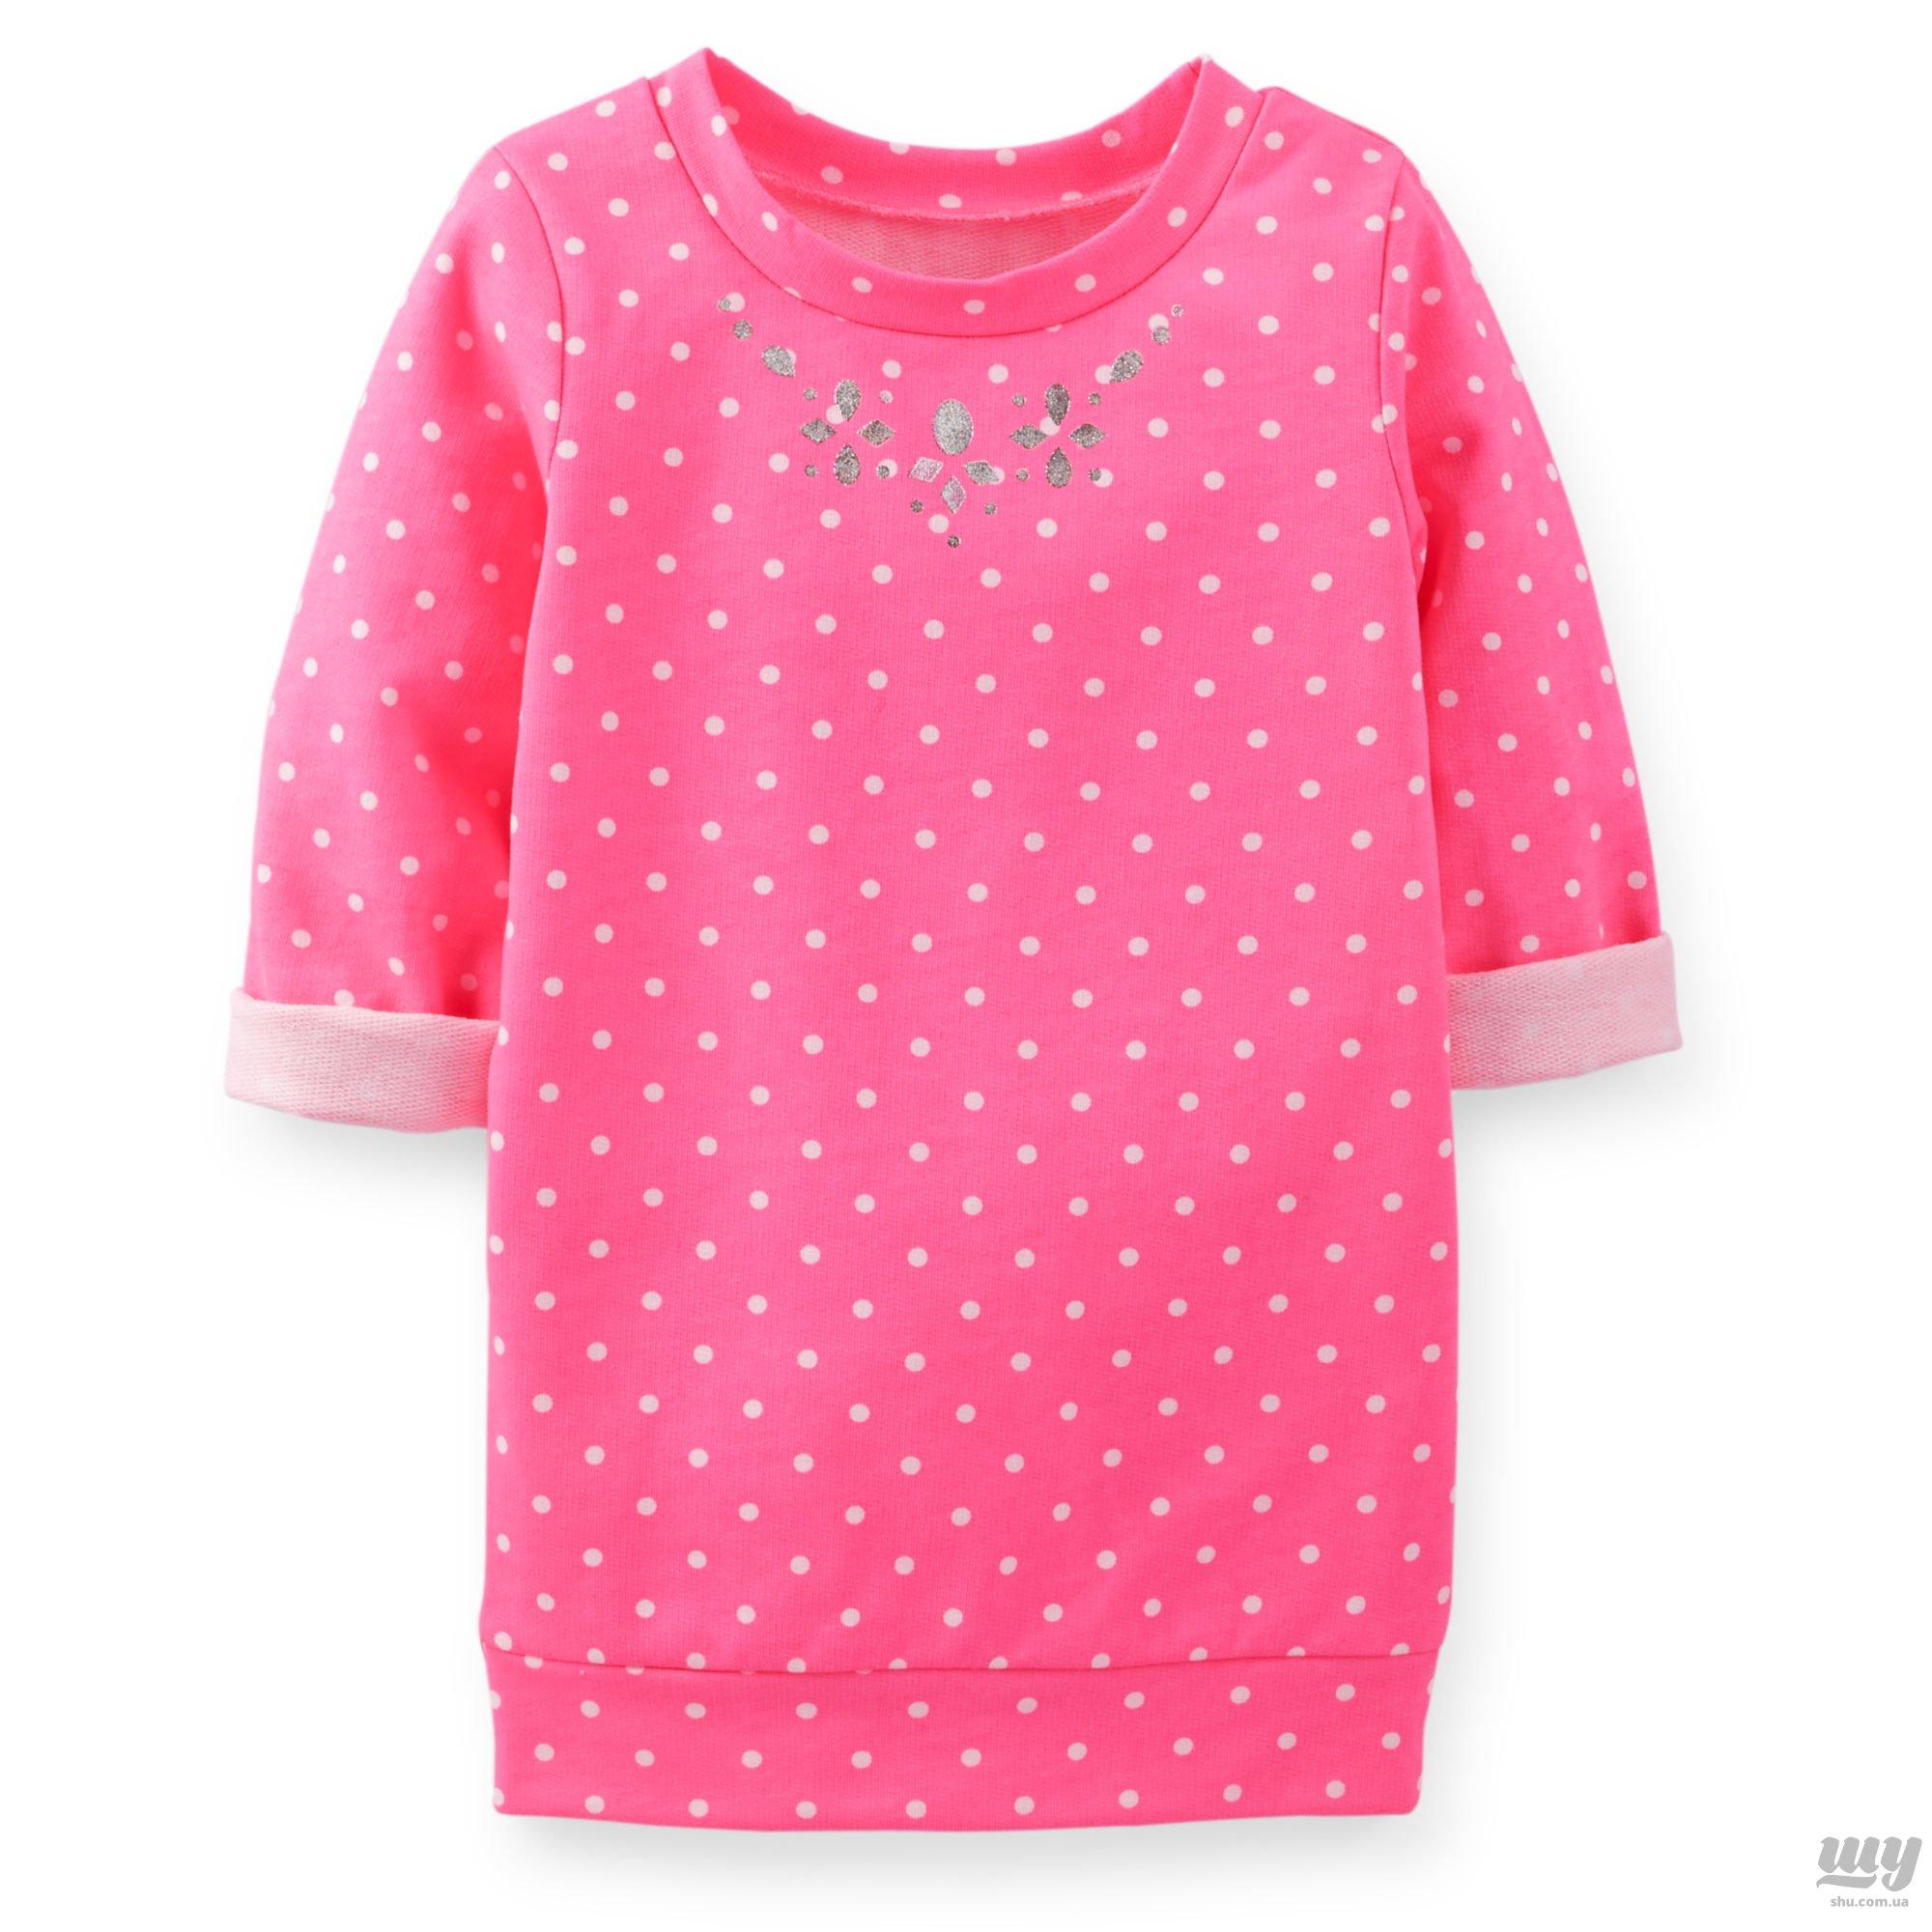 253B527_Pink.jpg